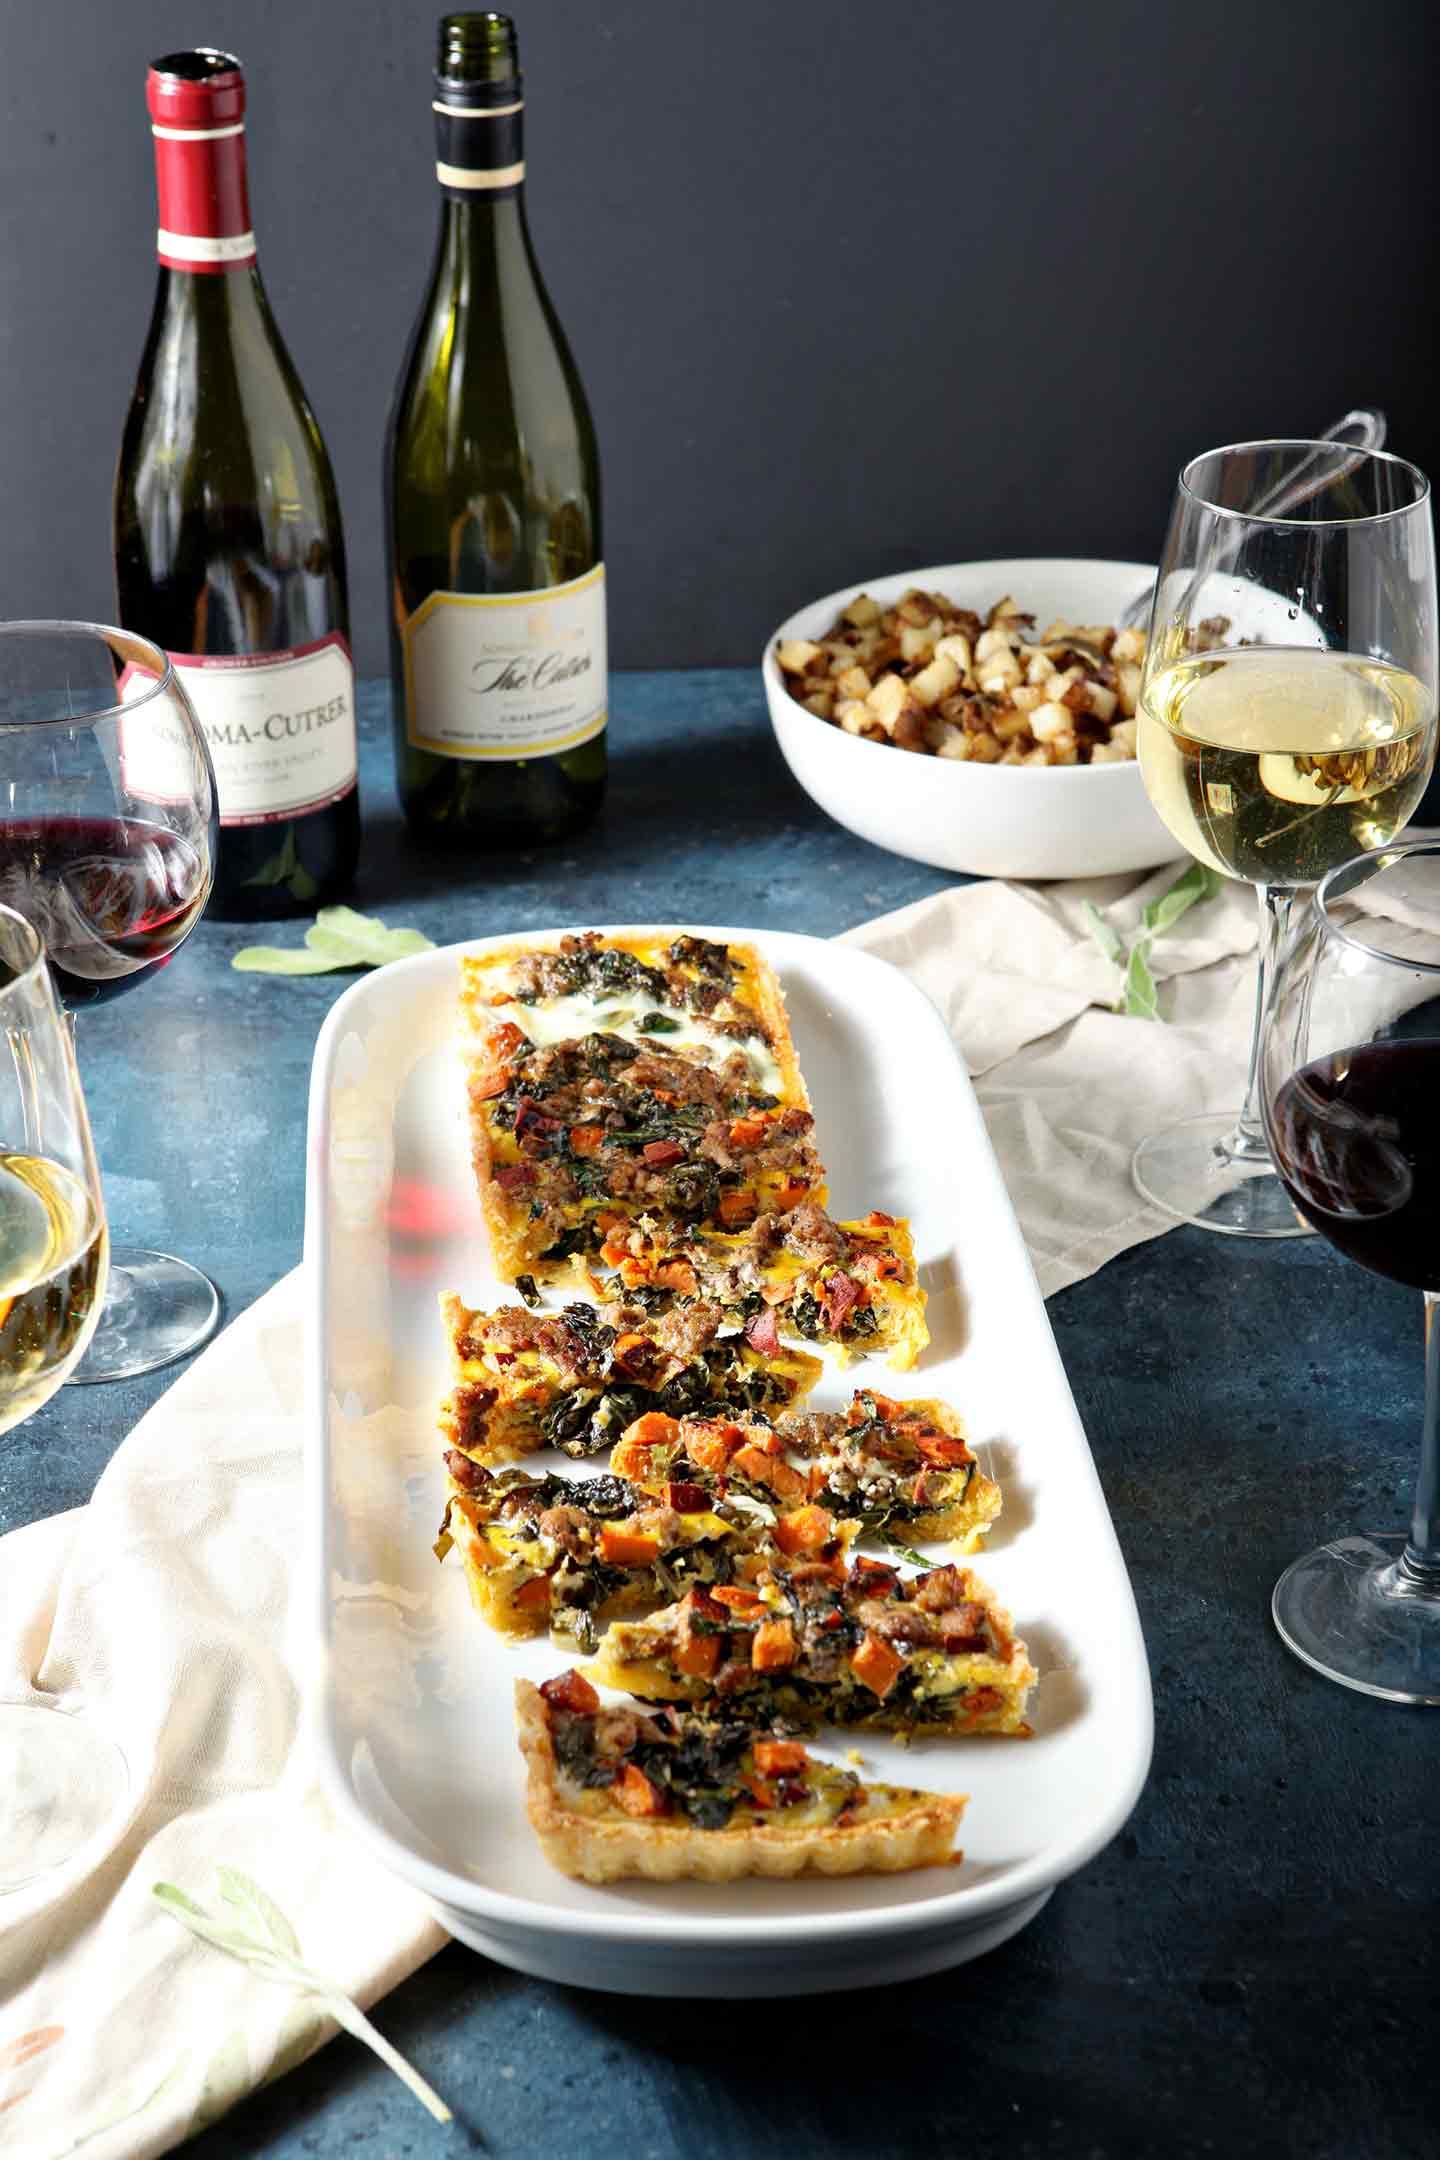 Festive Brunch: Hearty Winter Quiche and Wine